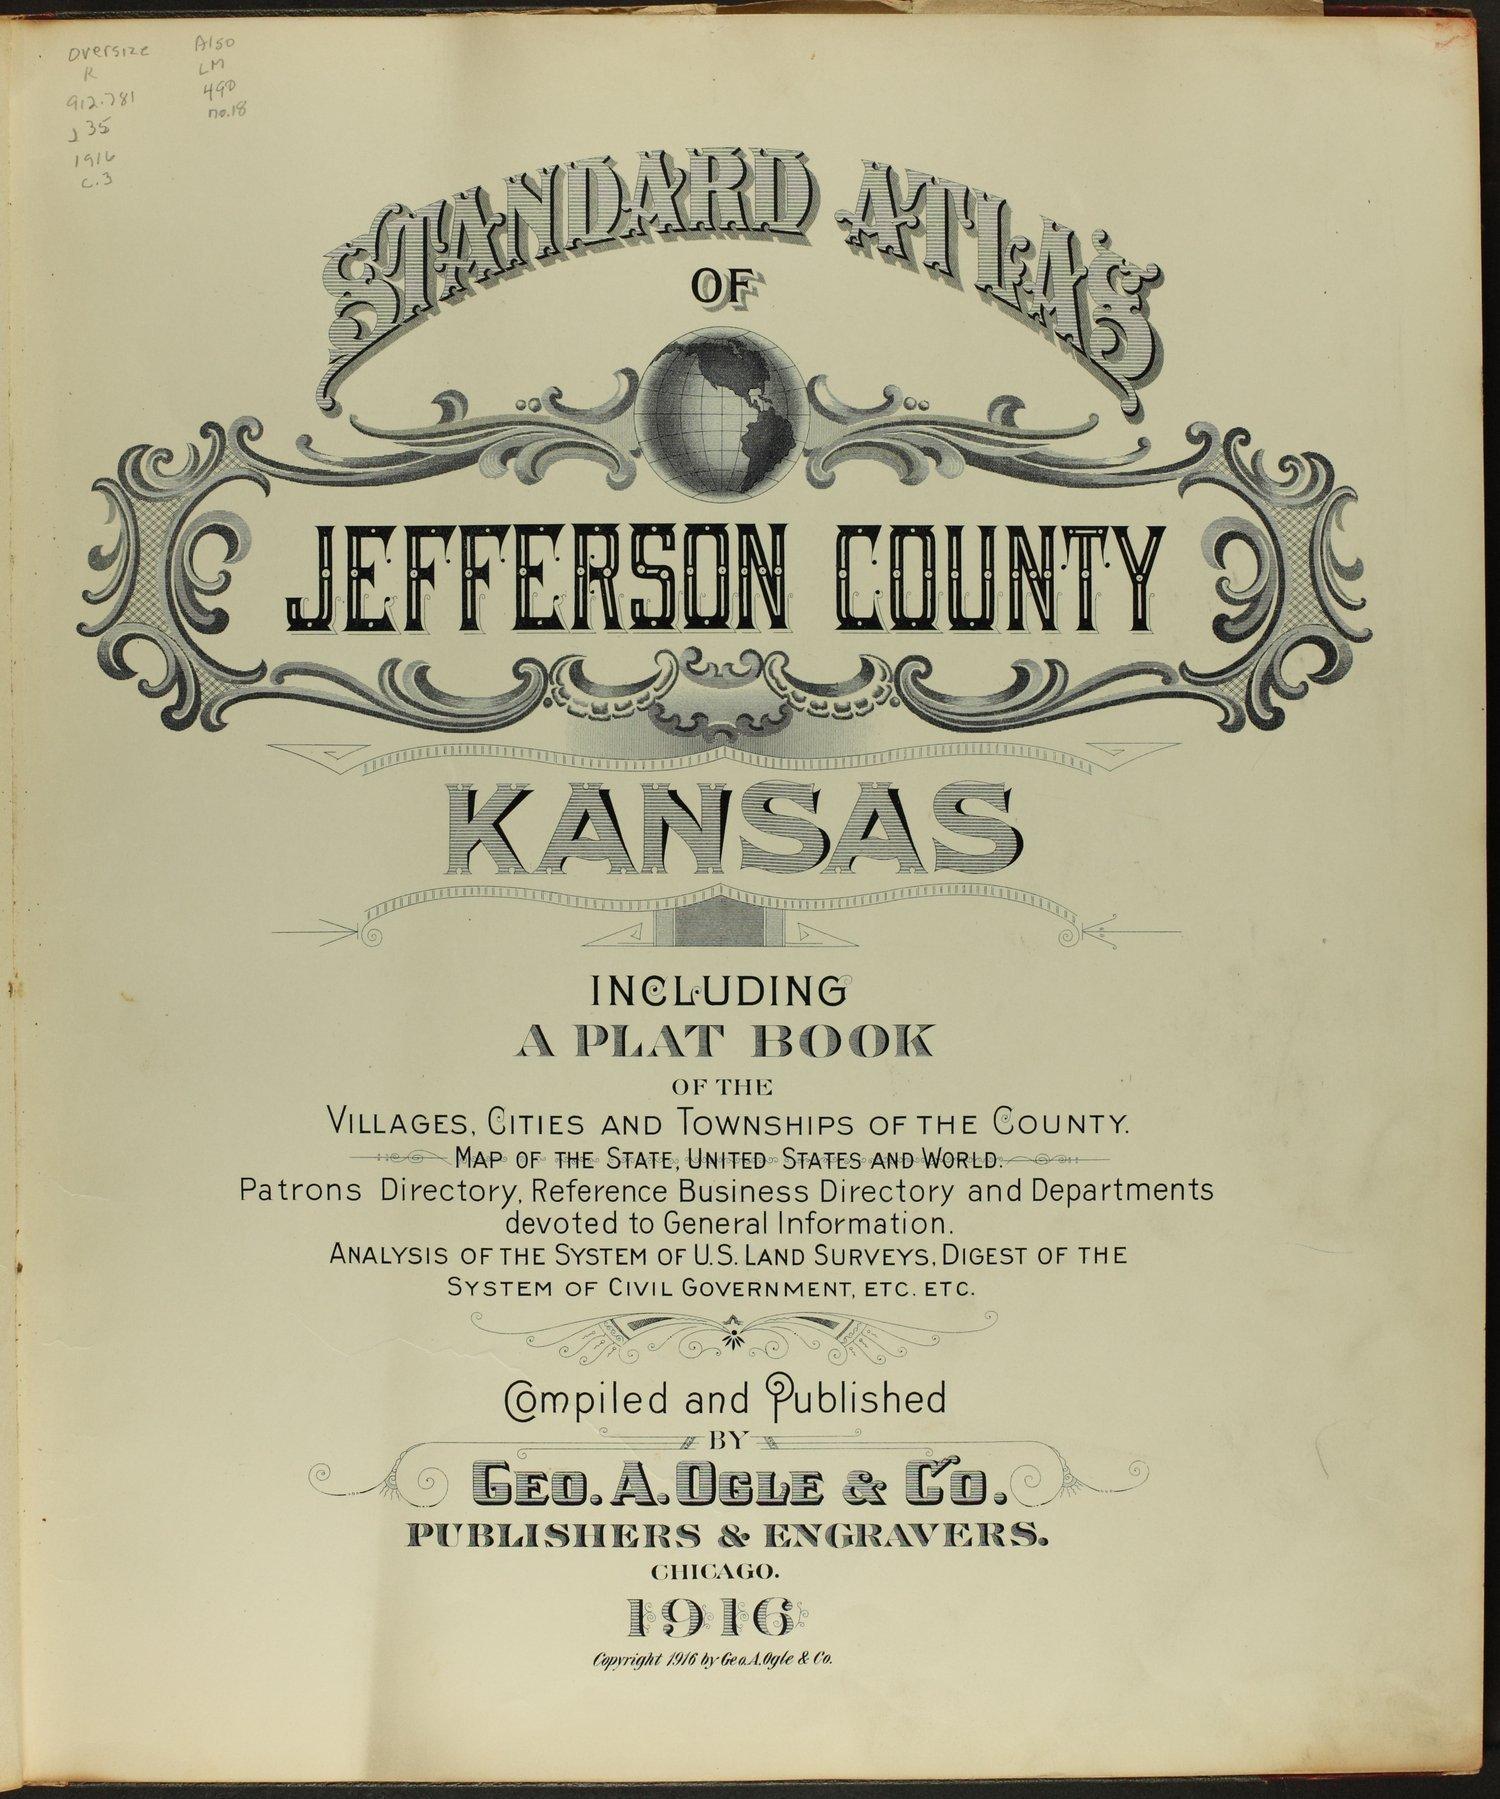 Standard atlas of Jefferson County, Kansas - Title Page